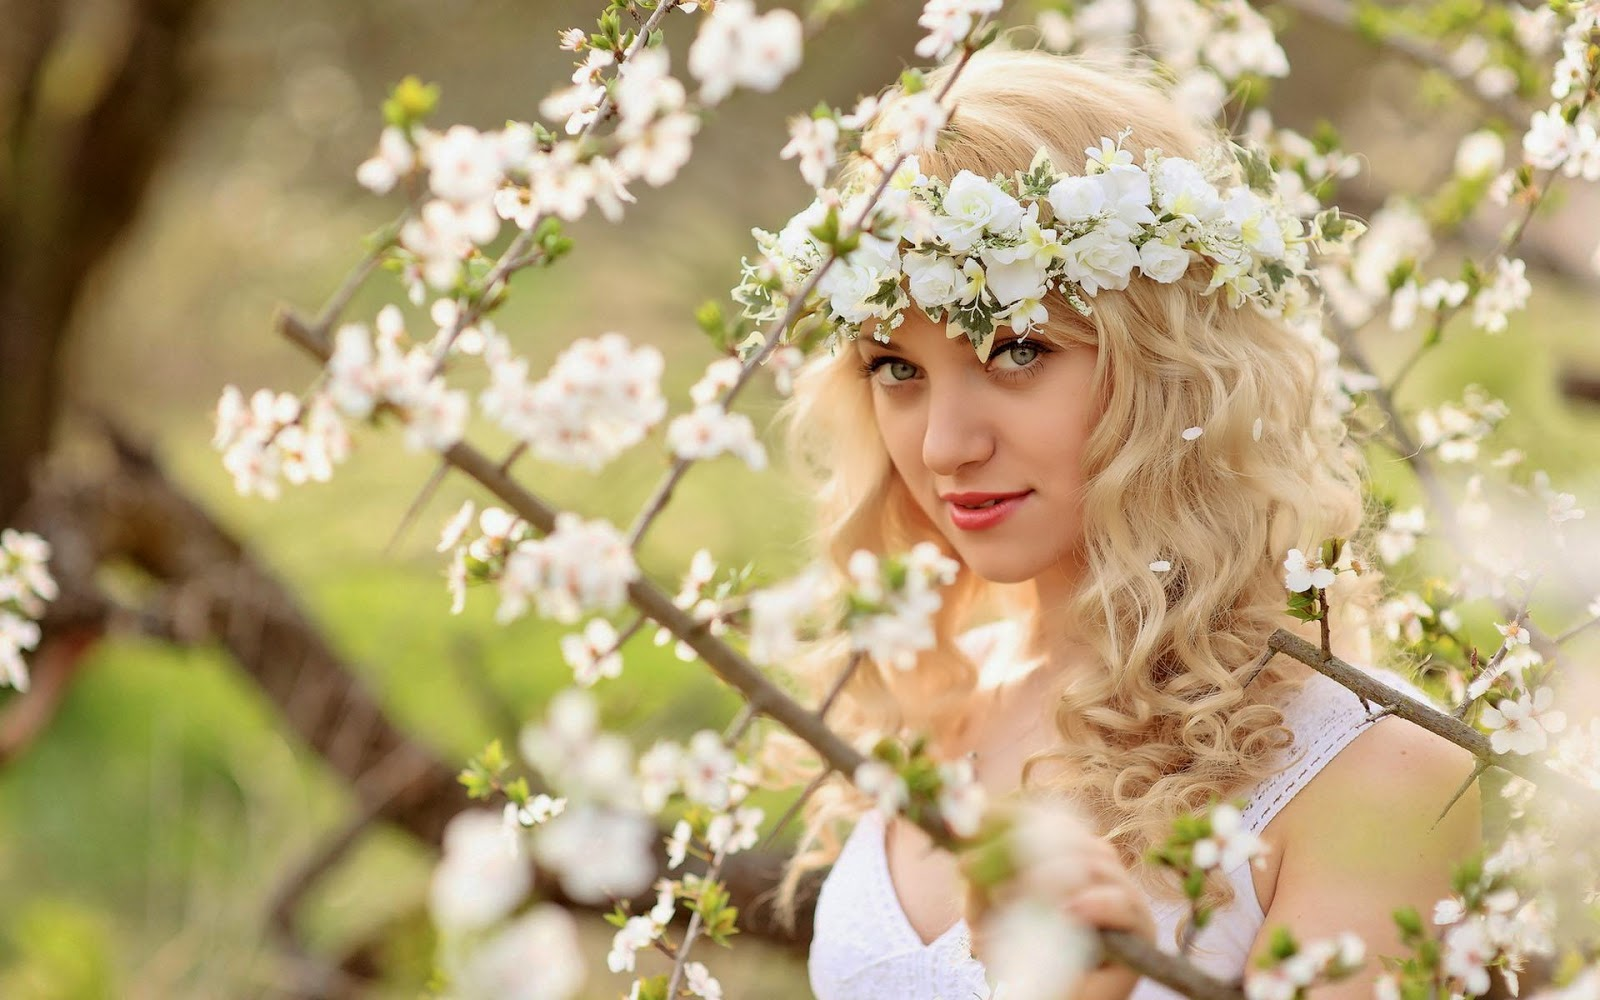 http://uupload.ir/files/lt29_beautiful-girls-with-flowers-crown-on-head-wallpapers.jpg